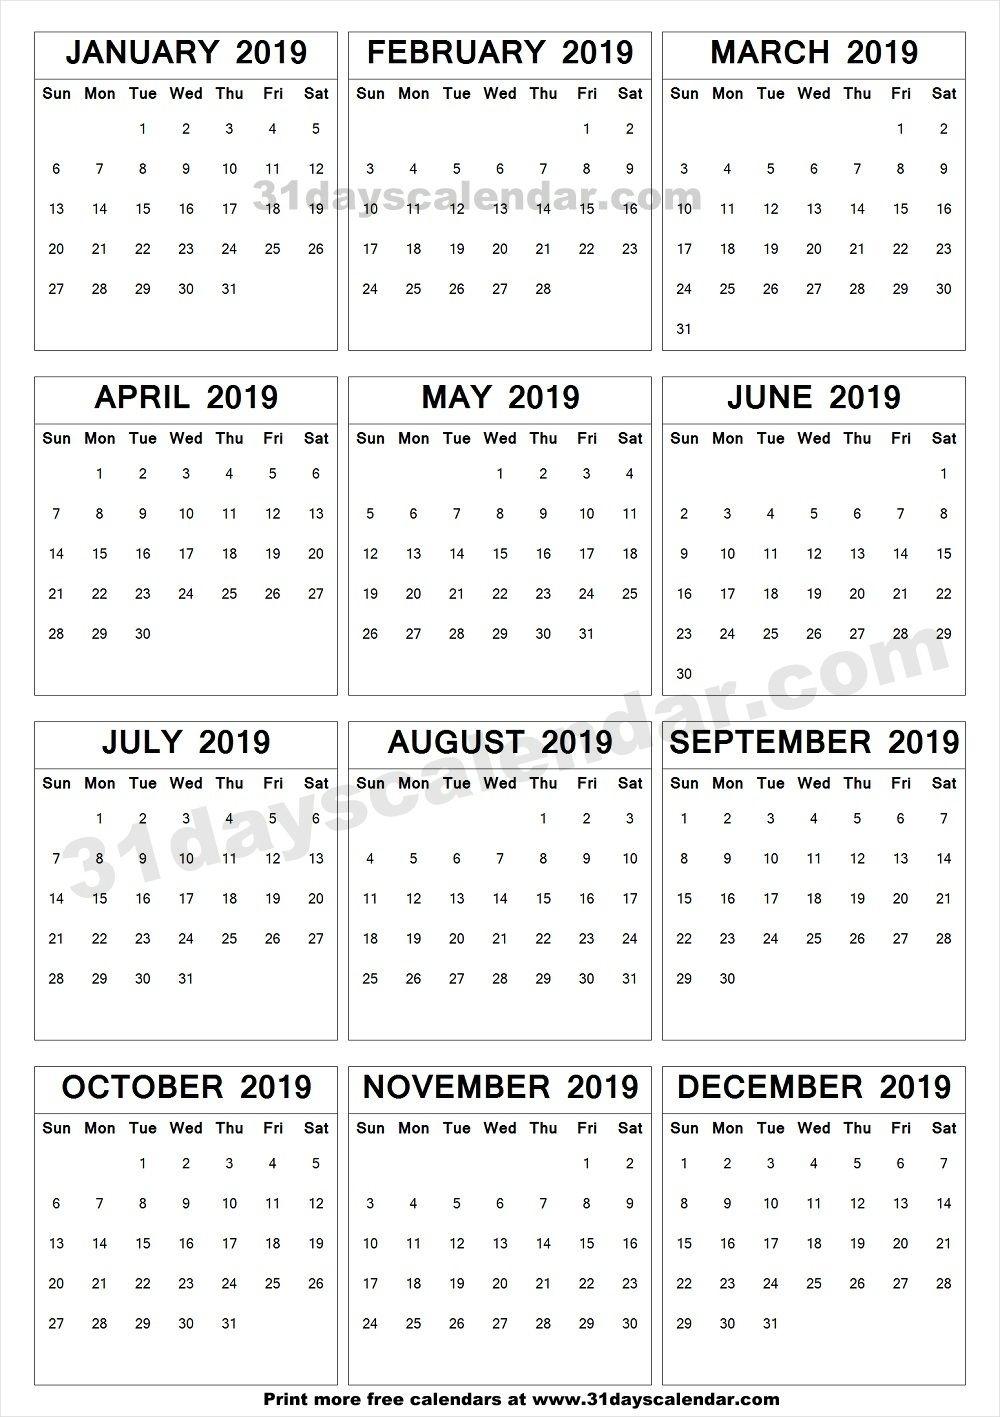 2019 A4 Calendar To Print | Yearly Calendar 2019 | Print Calendar_Printing A Calendar For 2019